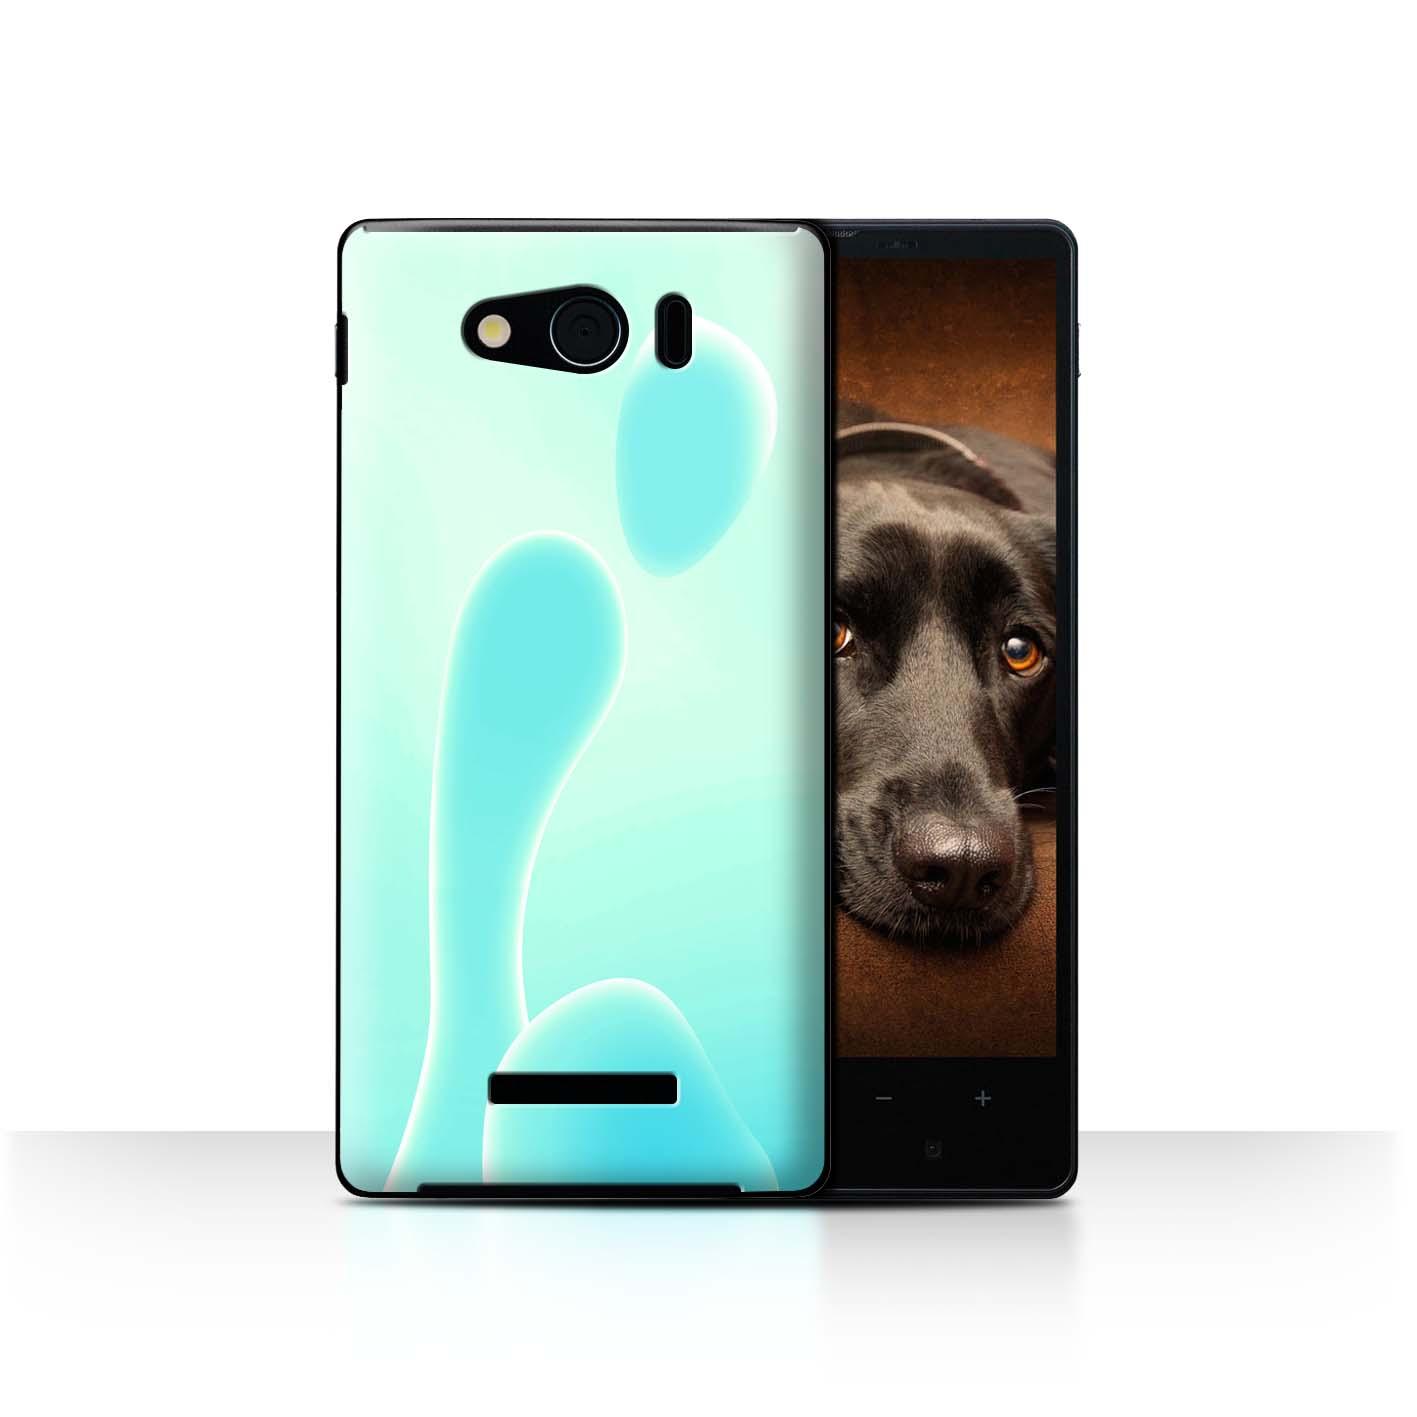 STUFF4-Back-Case-Cover-Skin-for-Sharp-Aquos-Xx-Mini-303SH-Lava-Lamp